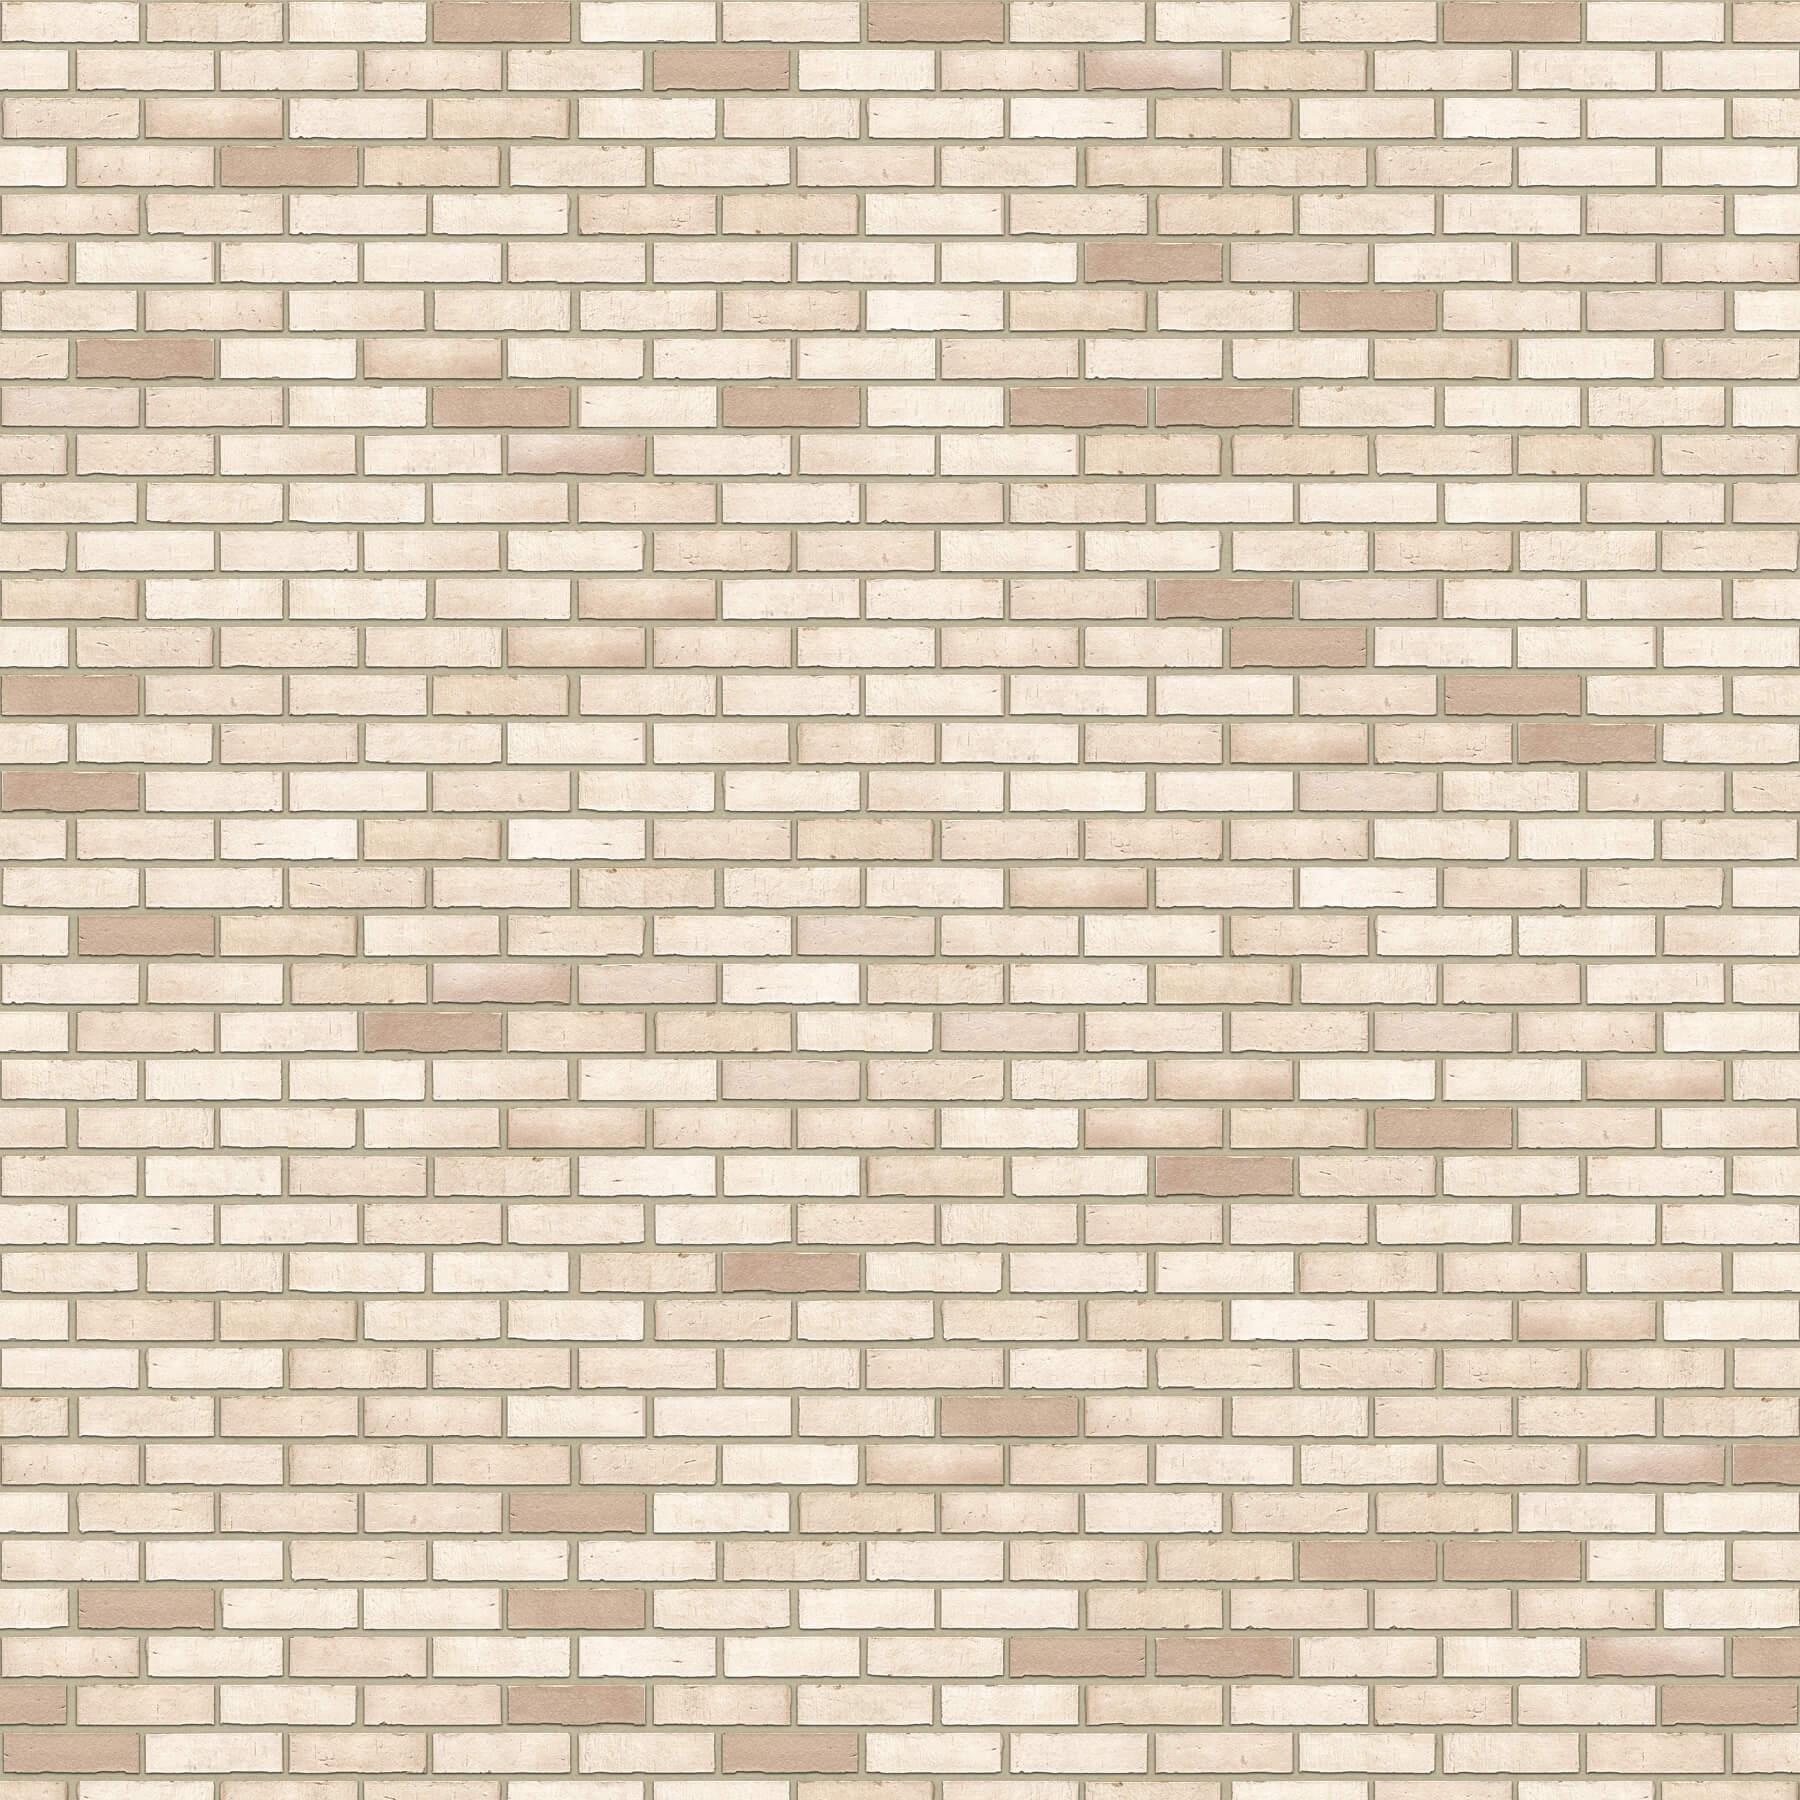 Puna-cigla-FeldHaus-Klinker-brick-house-beograd-nf-k-941-Bez Fuga